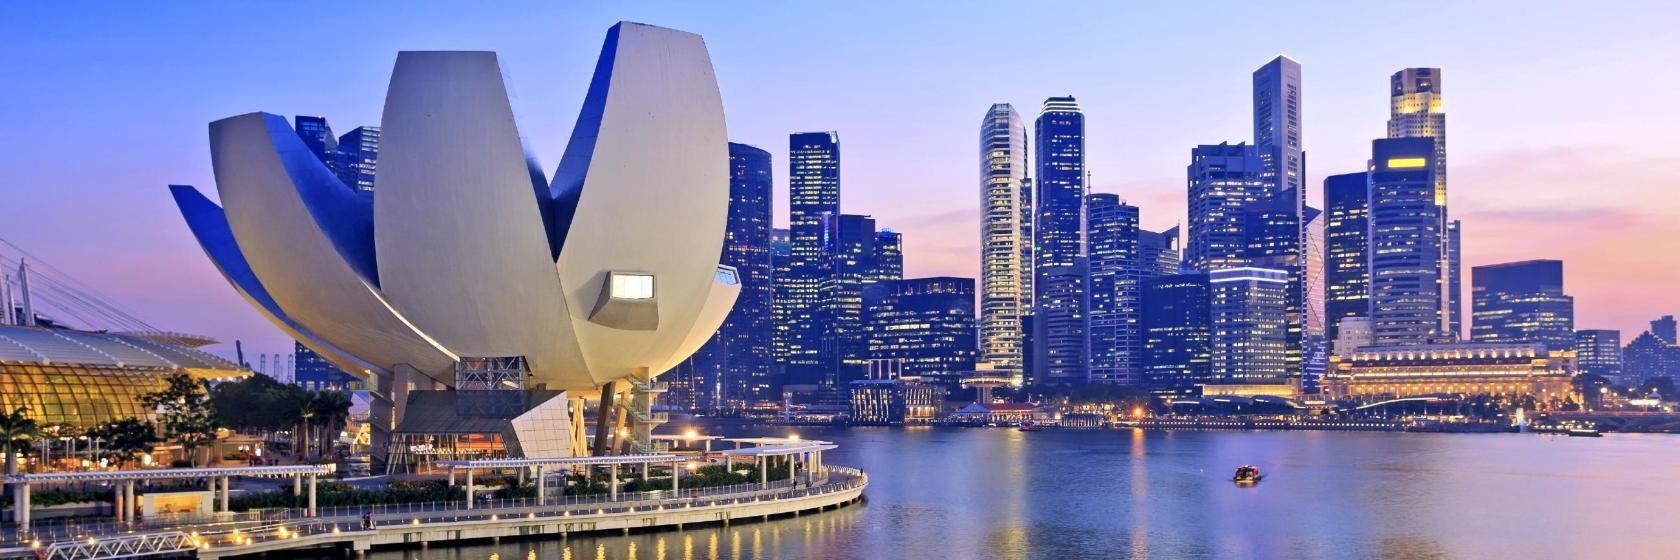 Singapore (سنگاپور)